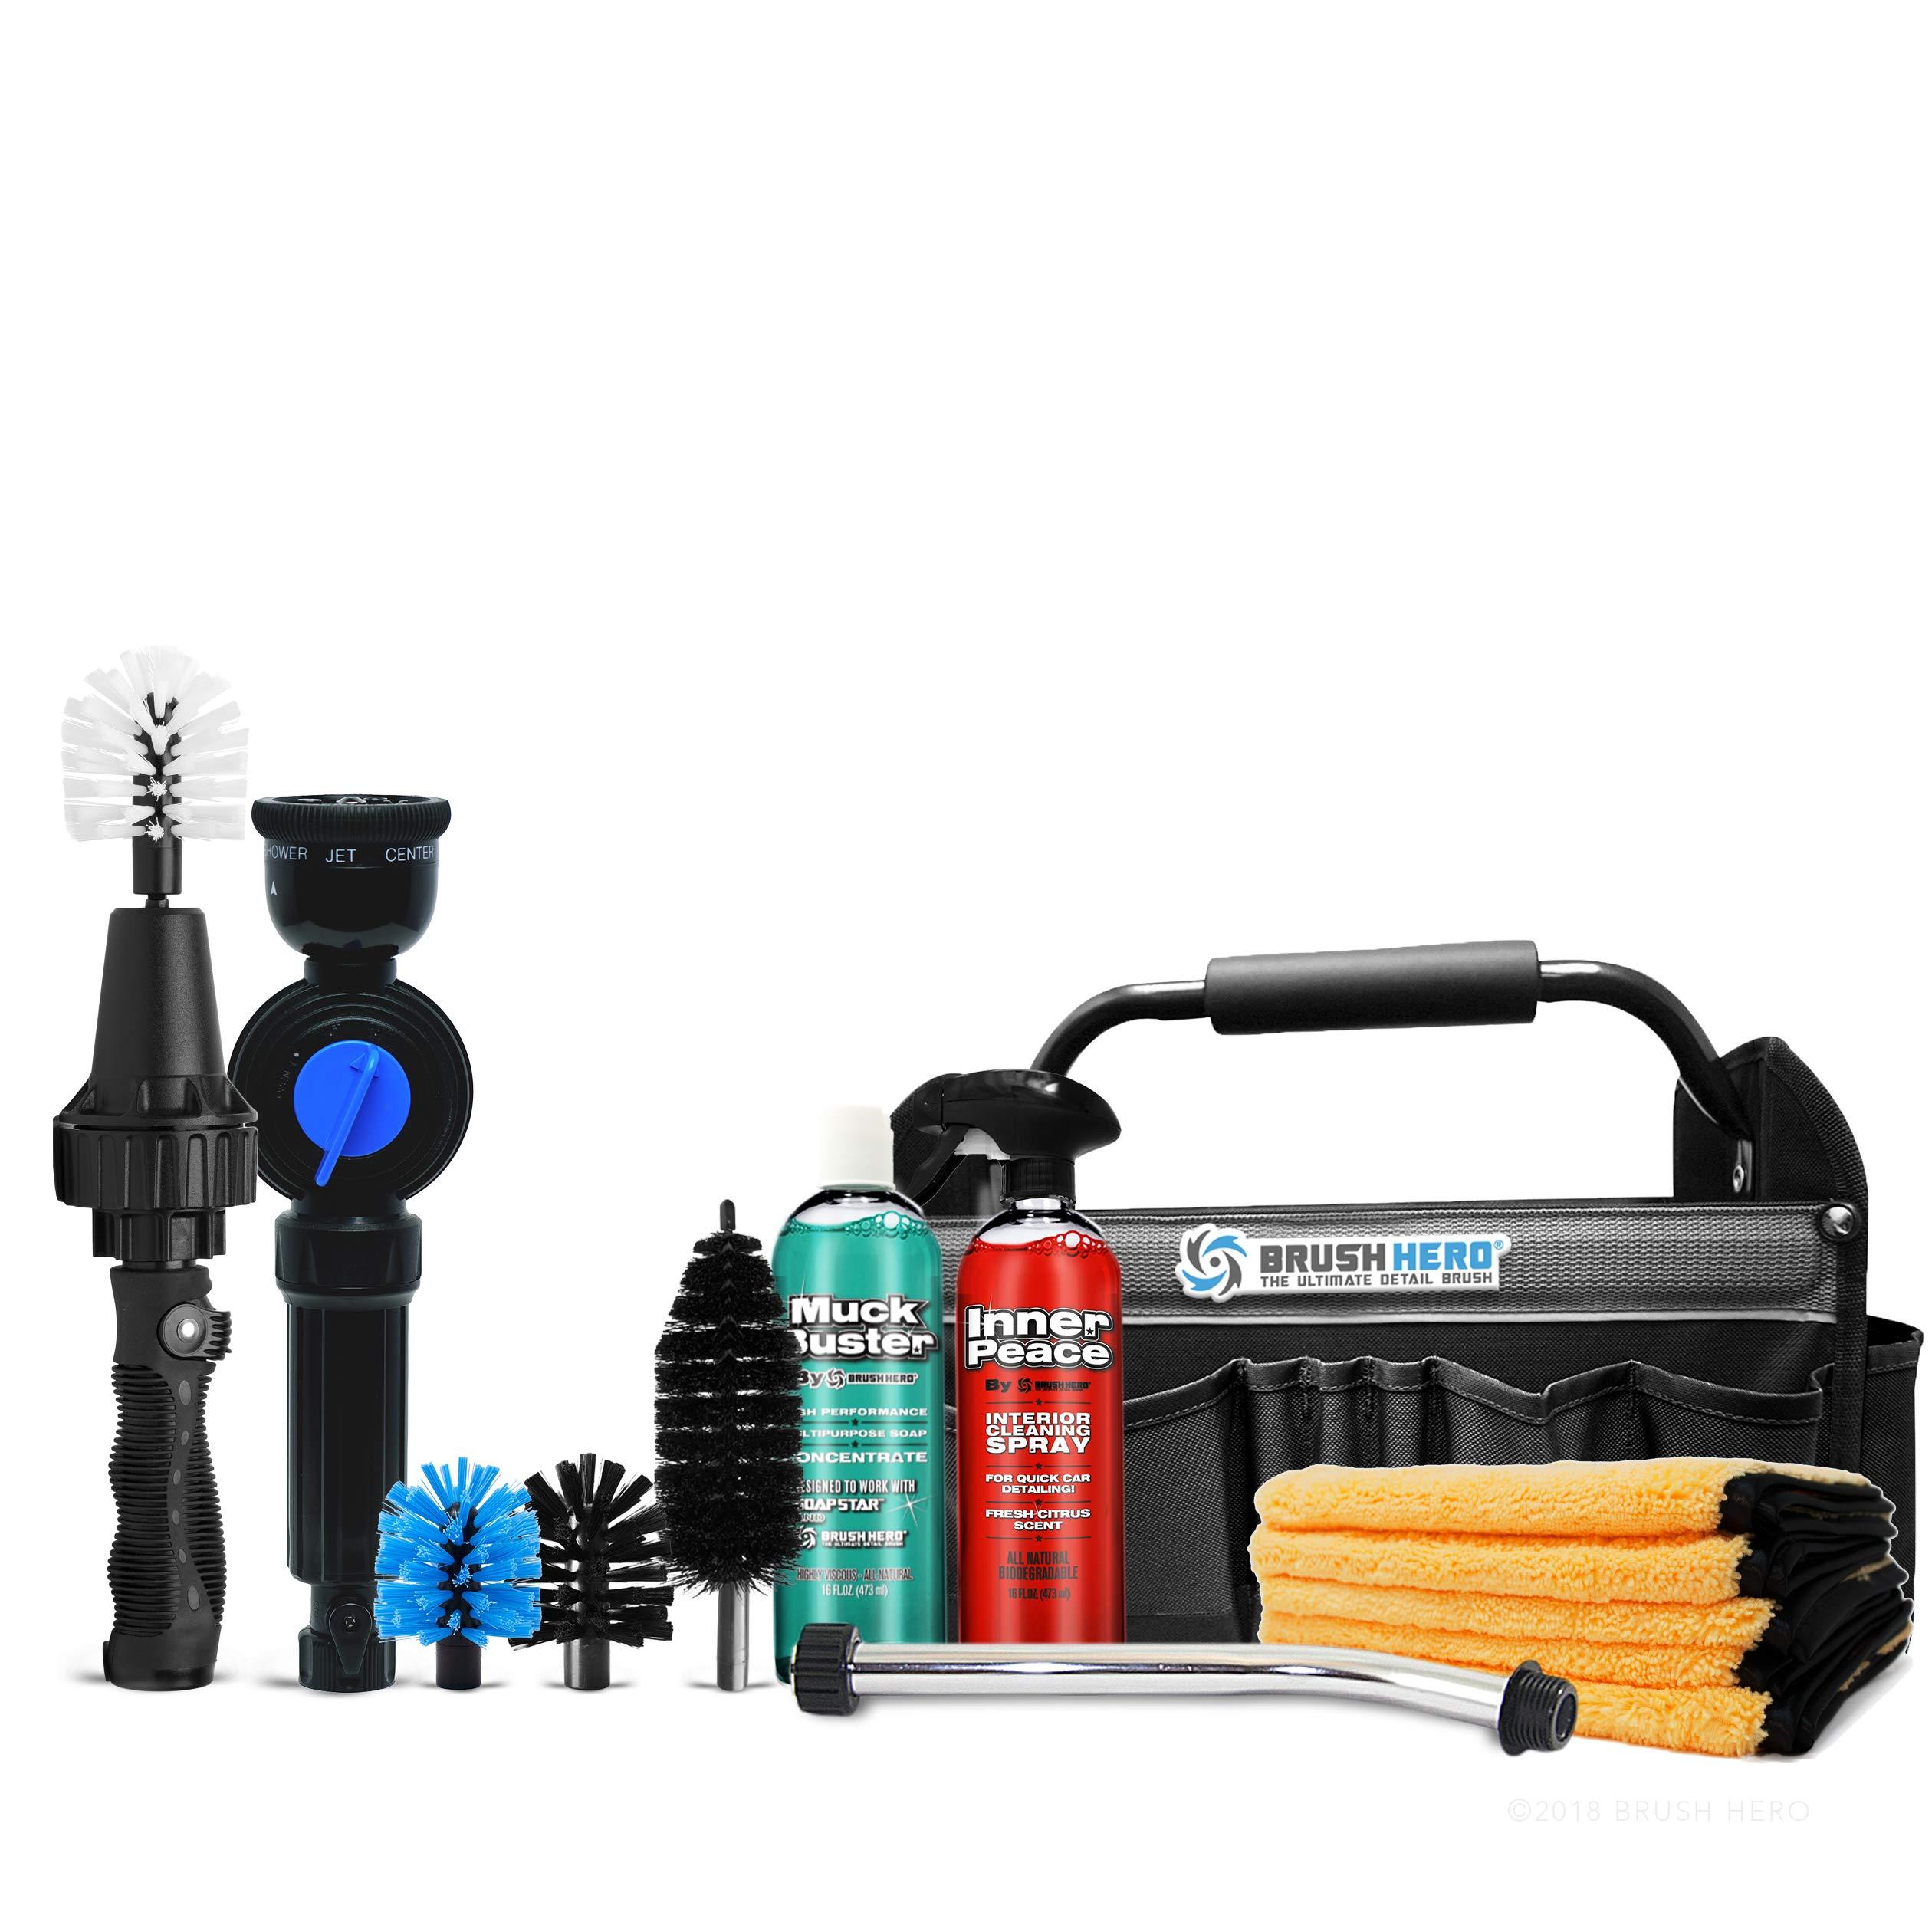 Brush Hero Master Set Includes Brush Hero Starter, Soap Star, 3 Extra Brushes, Soap, Interior Spray, Extension Wand, Microfiber, Utility Bag by Brush Hero (Image #1)